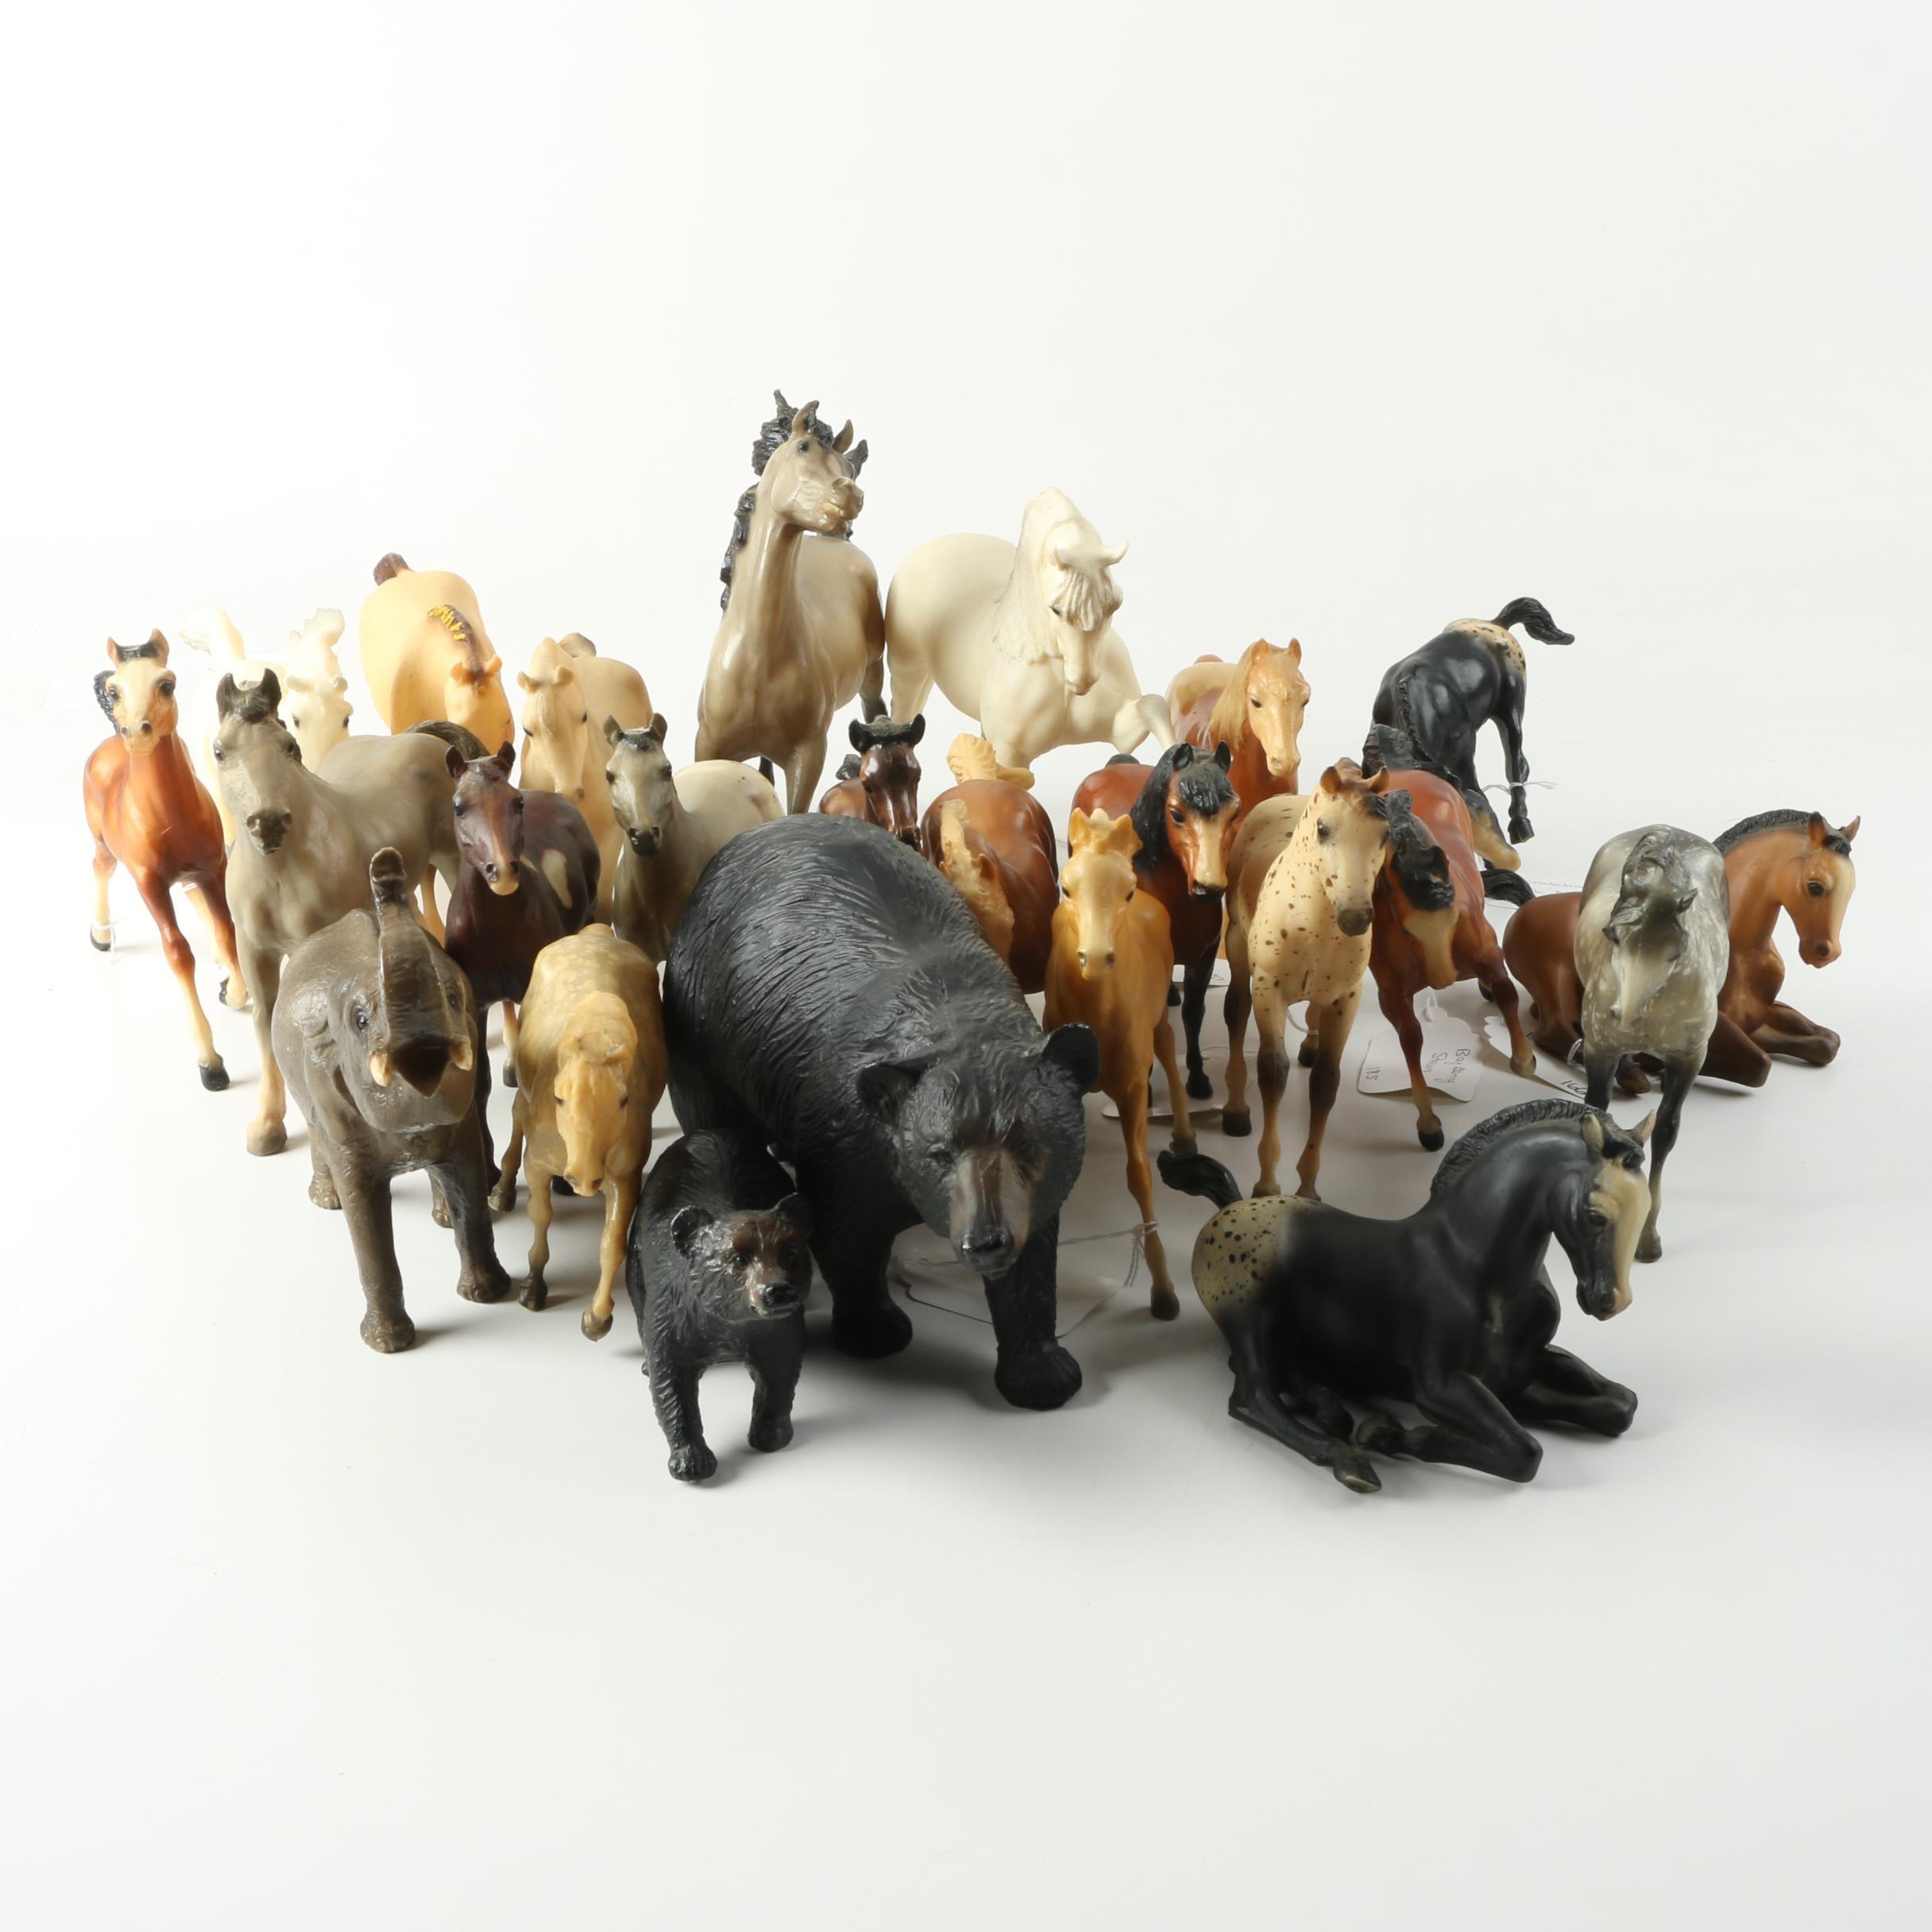 Horse, Bear and Elephant Figurines